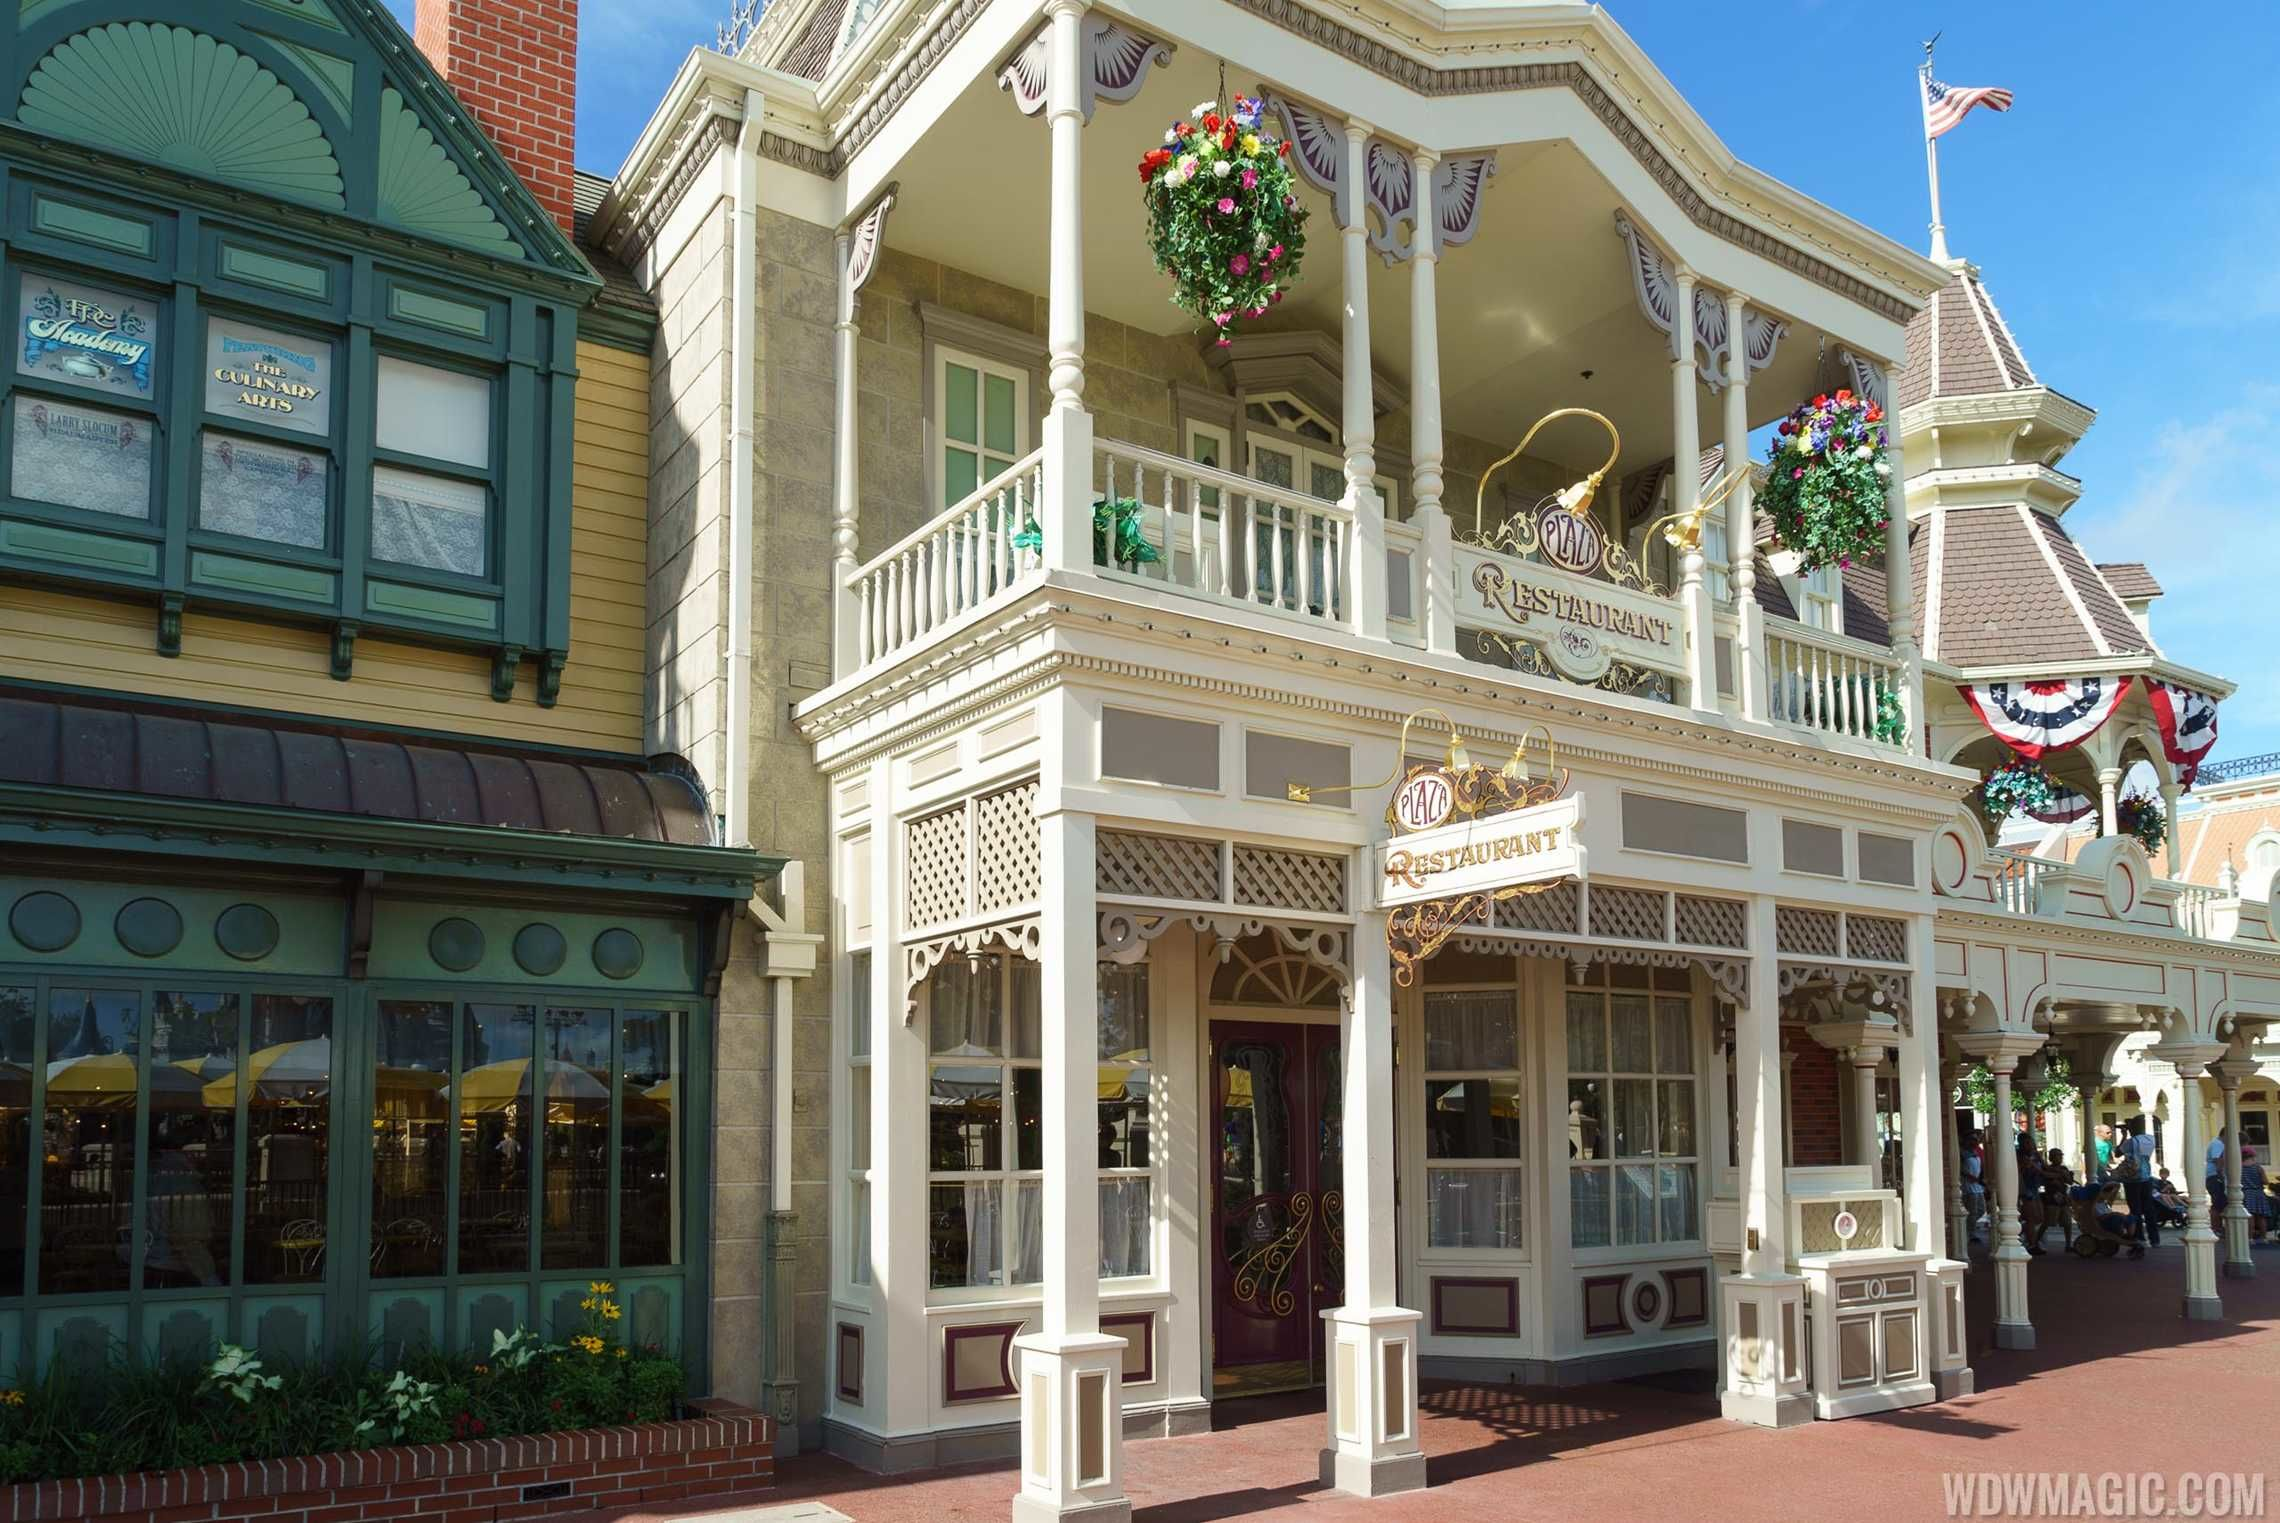 Nggak Hanya Wahana Seru, Ini Deretan Restoran Terbaik di Disney World